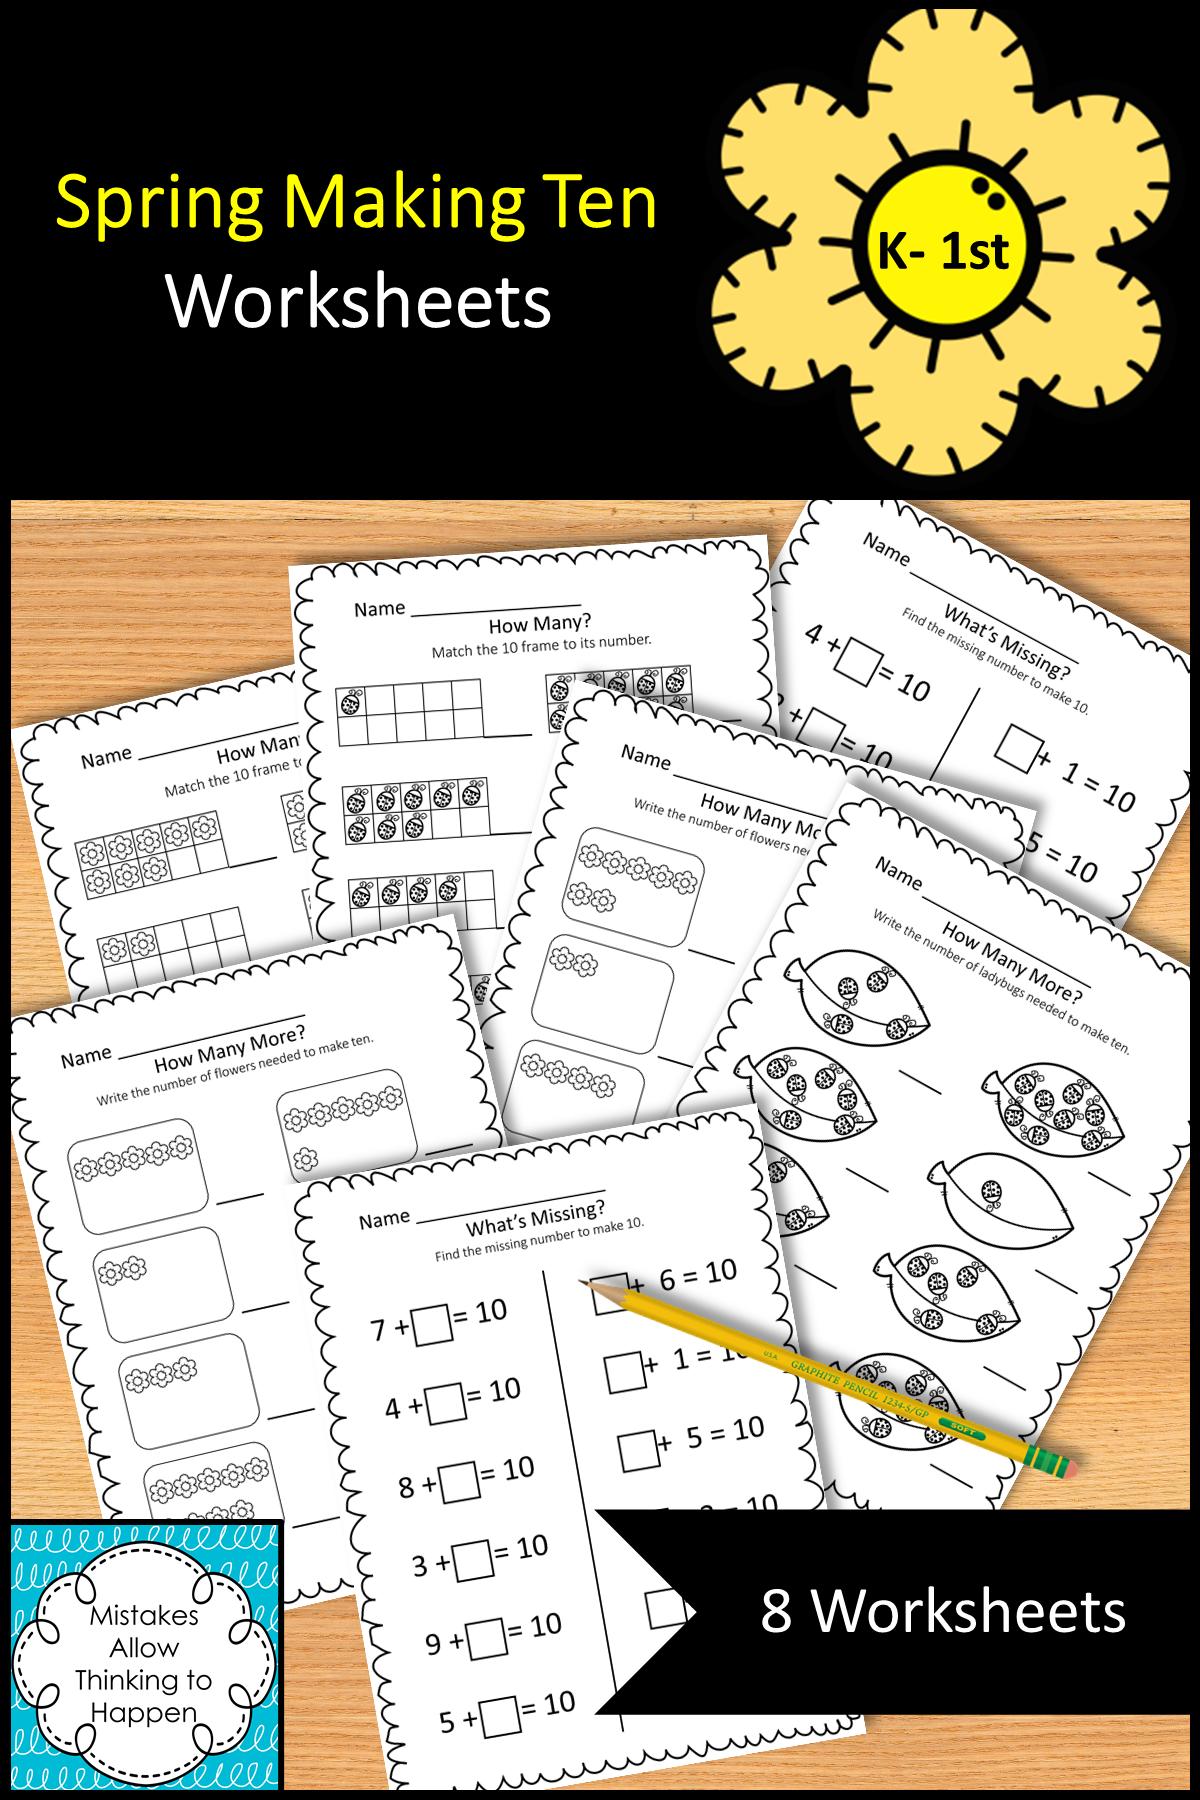 Spring Making Ten Worksheets   Math for 1st graders [ 1800 x 1200 Pixel ]